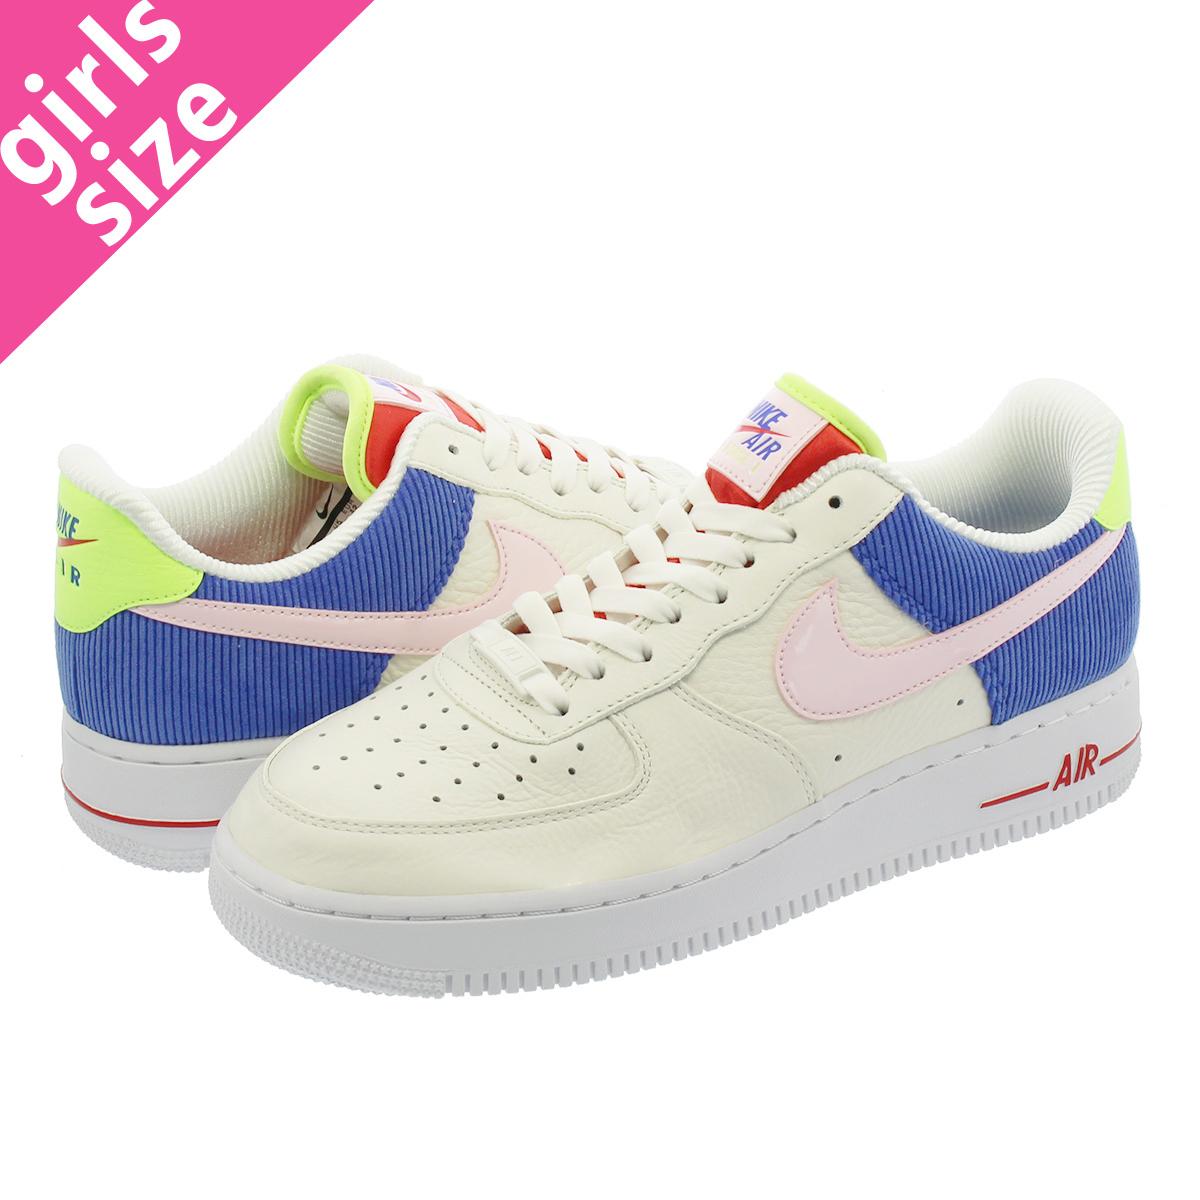 NIKE WMNS AIR FORCE 1 LOW Nike women air force 1 low SAILARCTIC PINKRACER BLUE aq4139 101